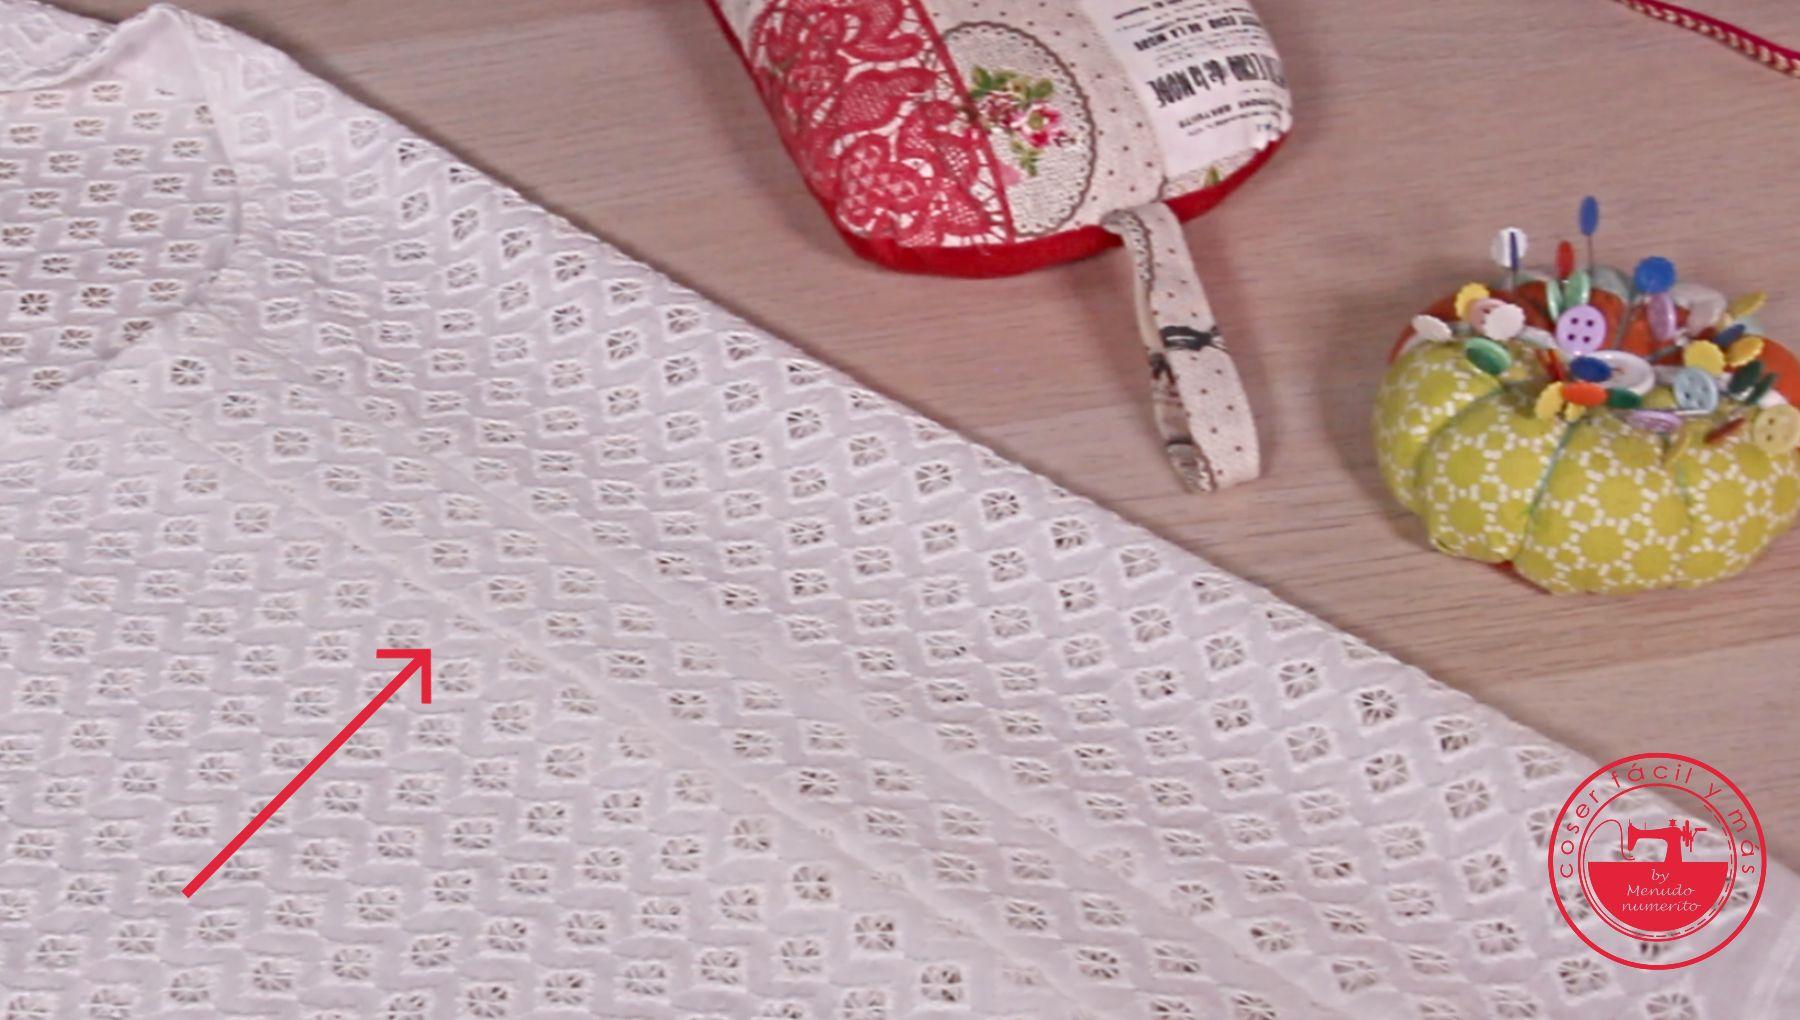 agrandar blusa menudo numerito blog de costura